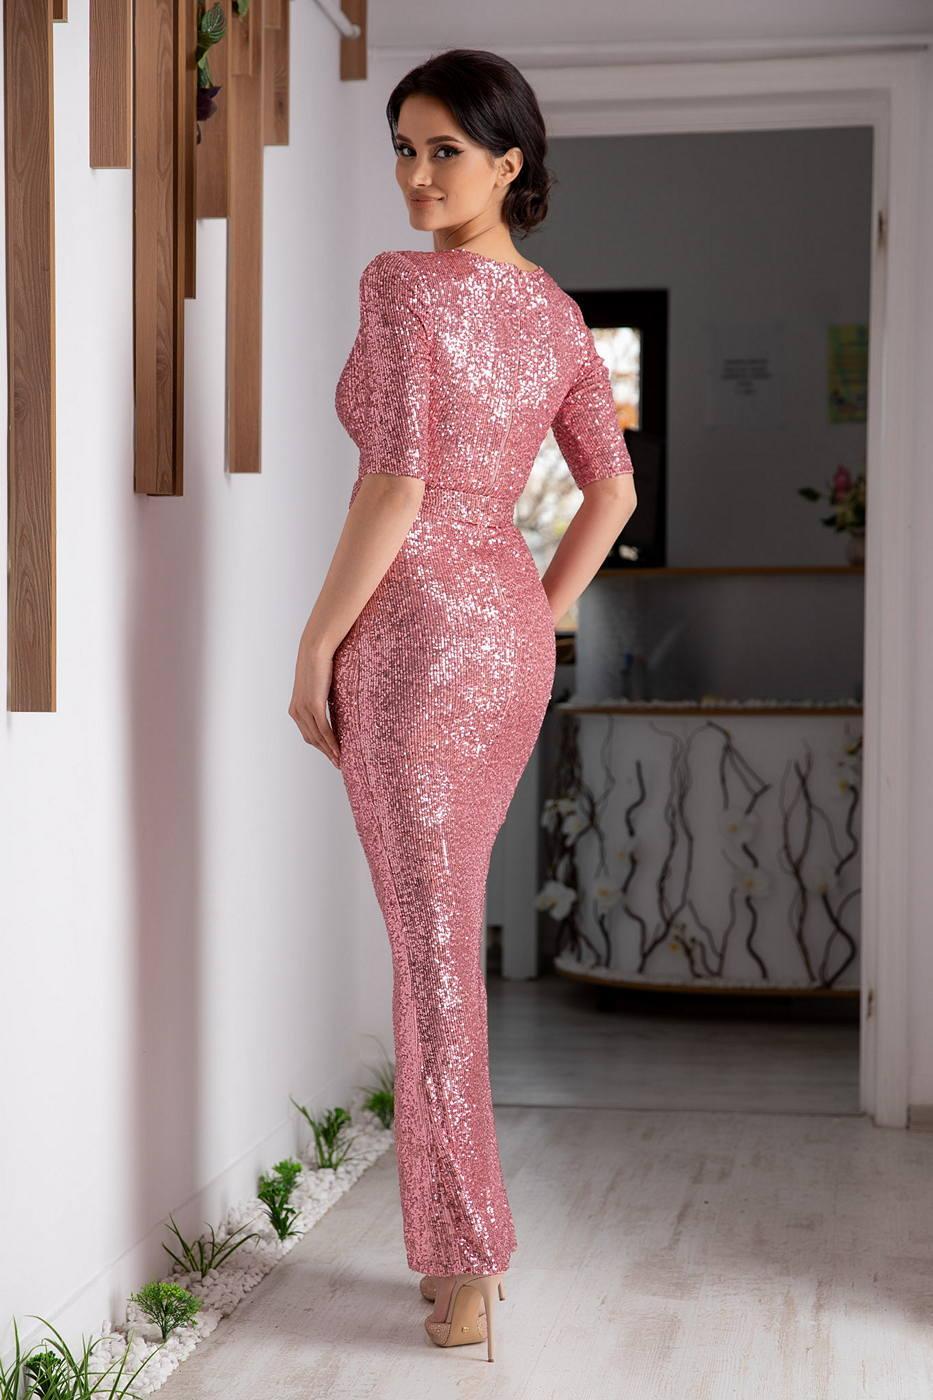 Extasy Ροζ Φόρεμα 4638